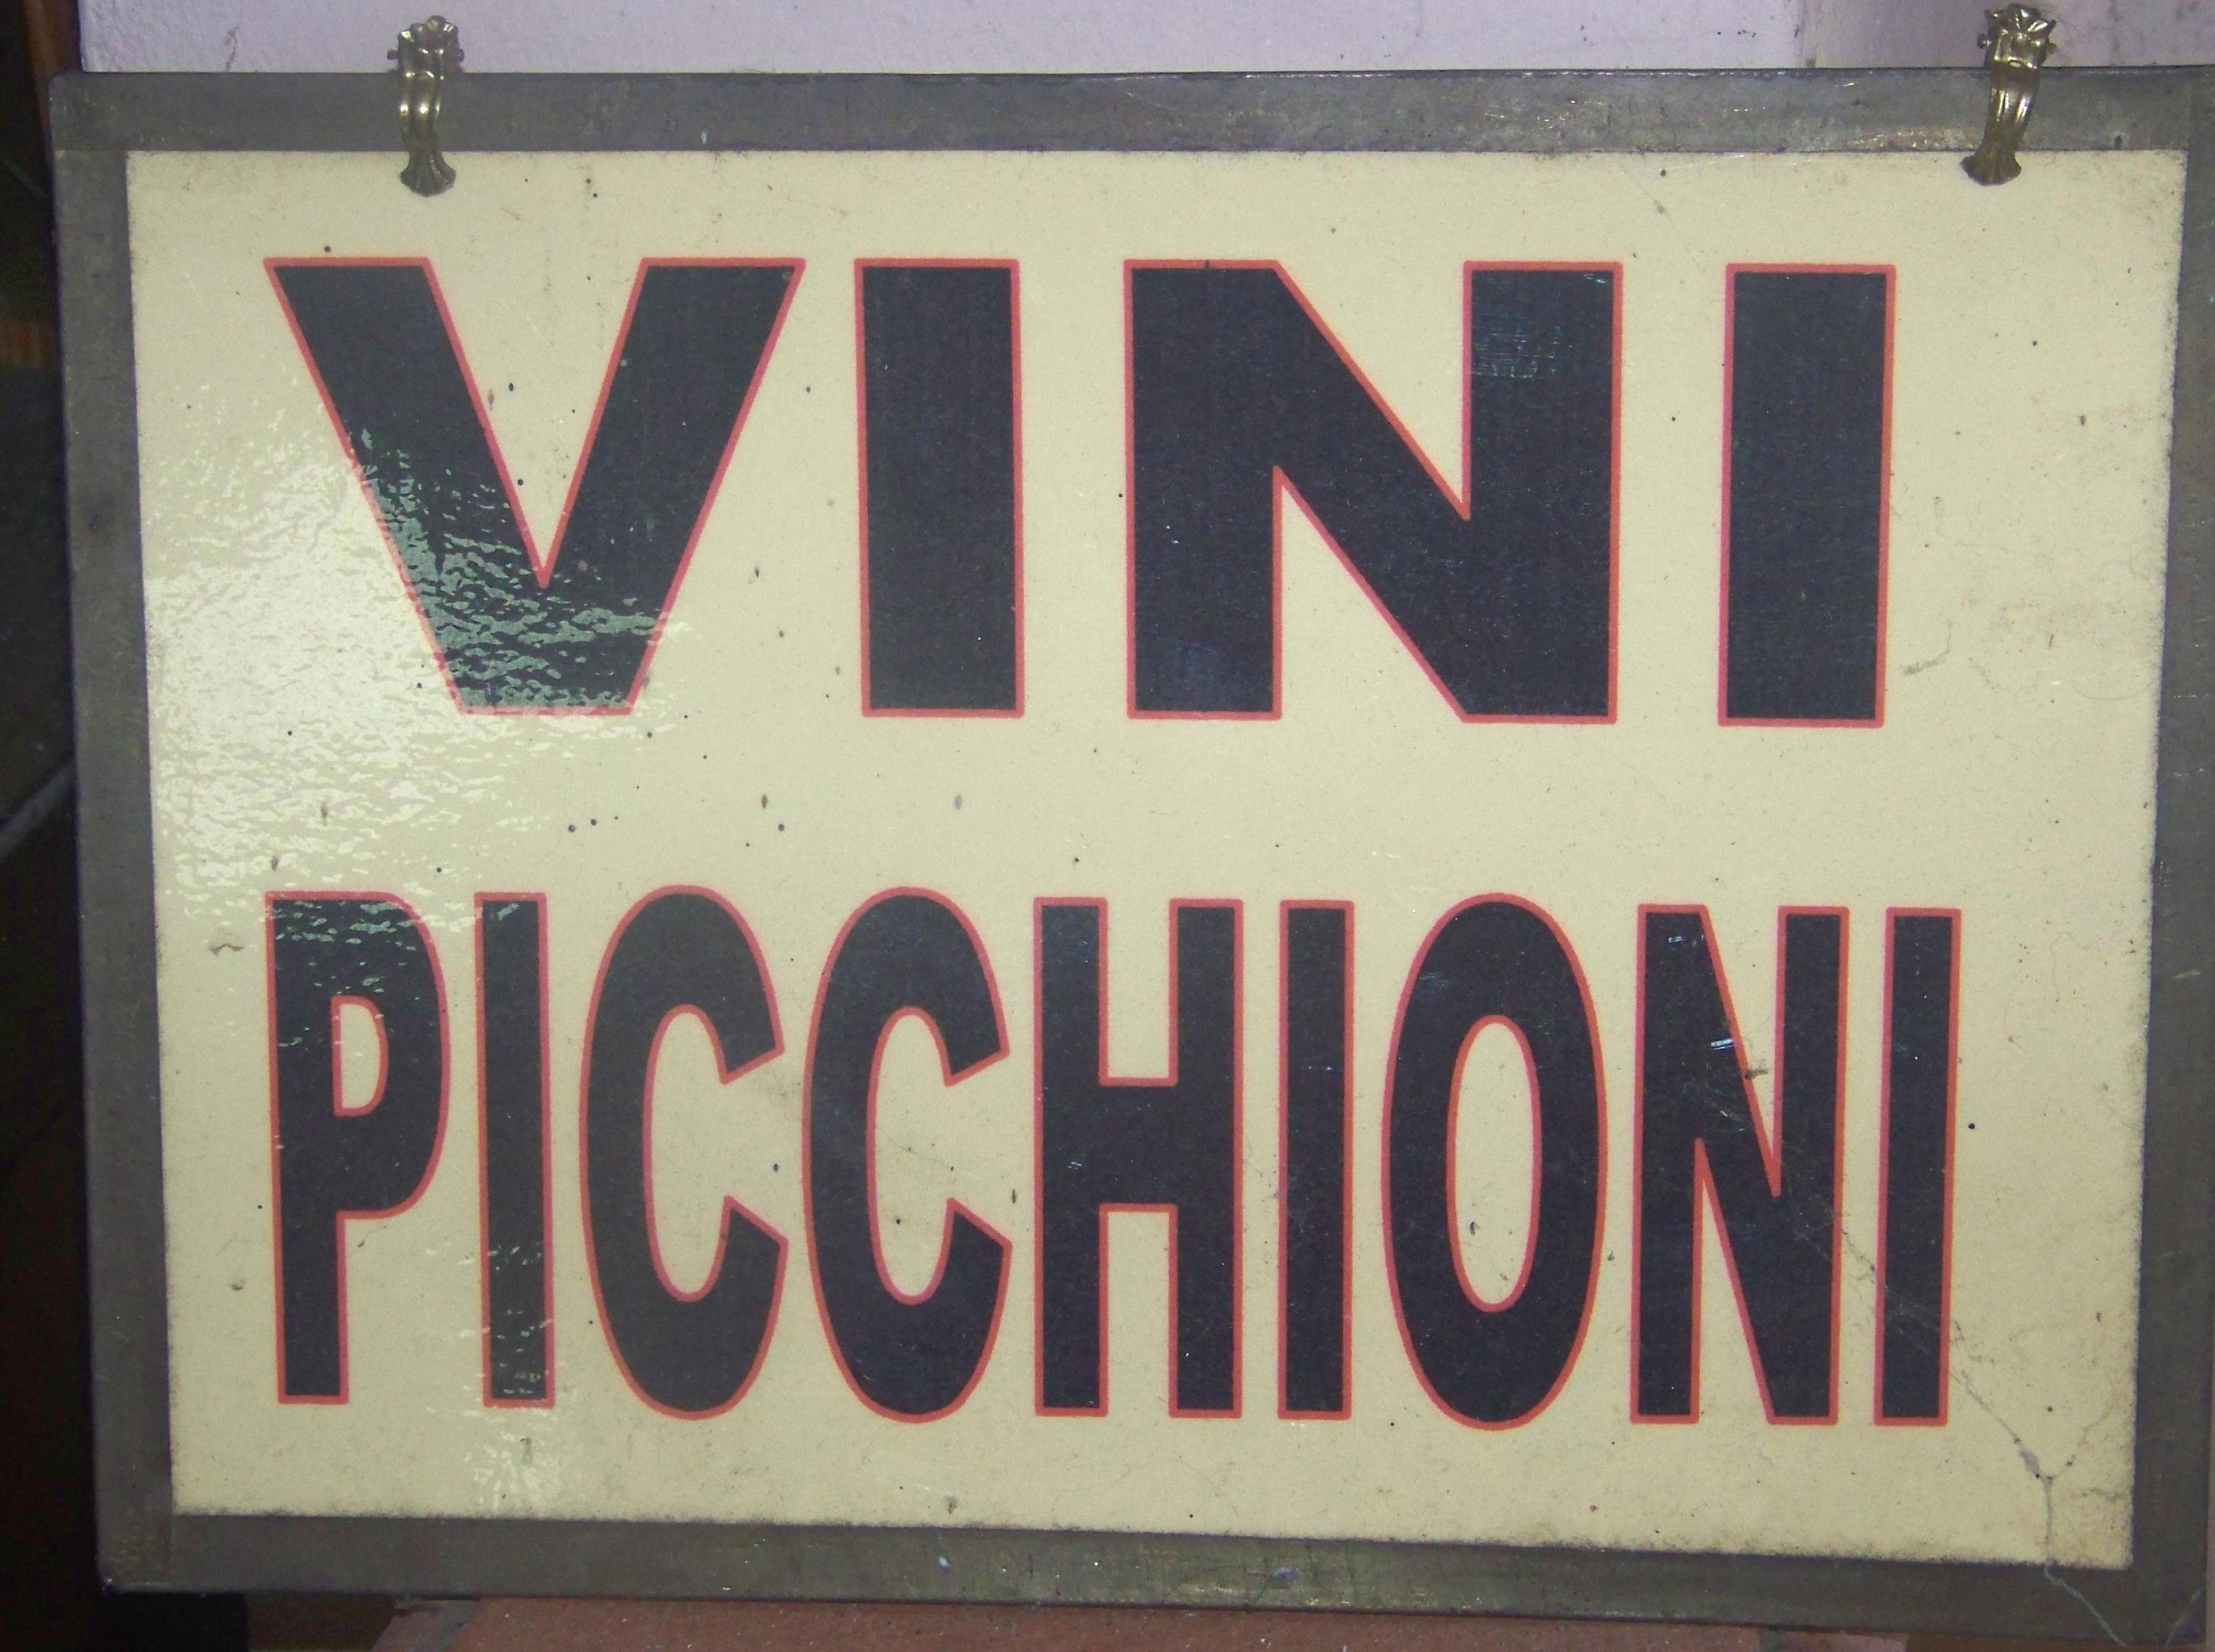 Vini Picchioni